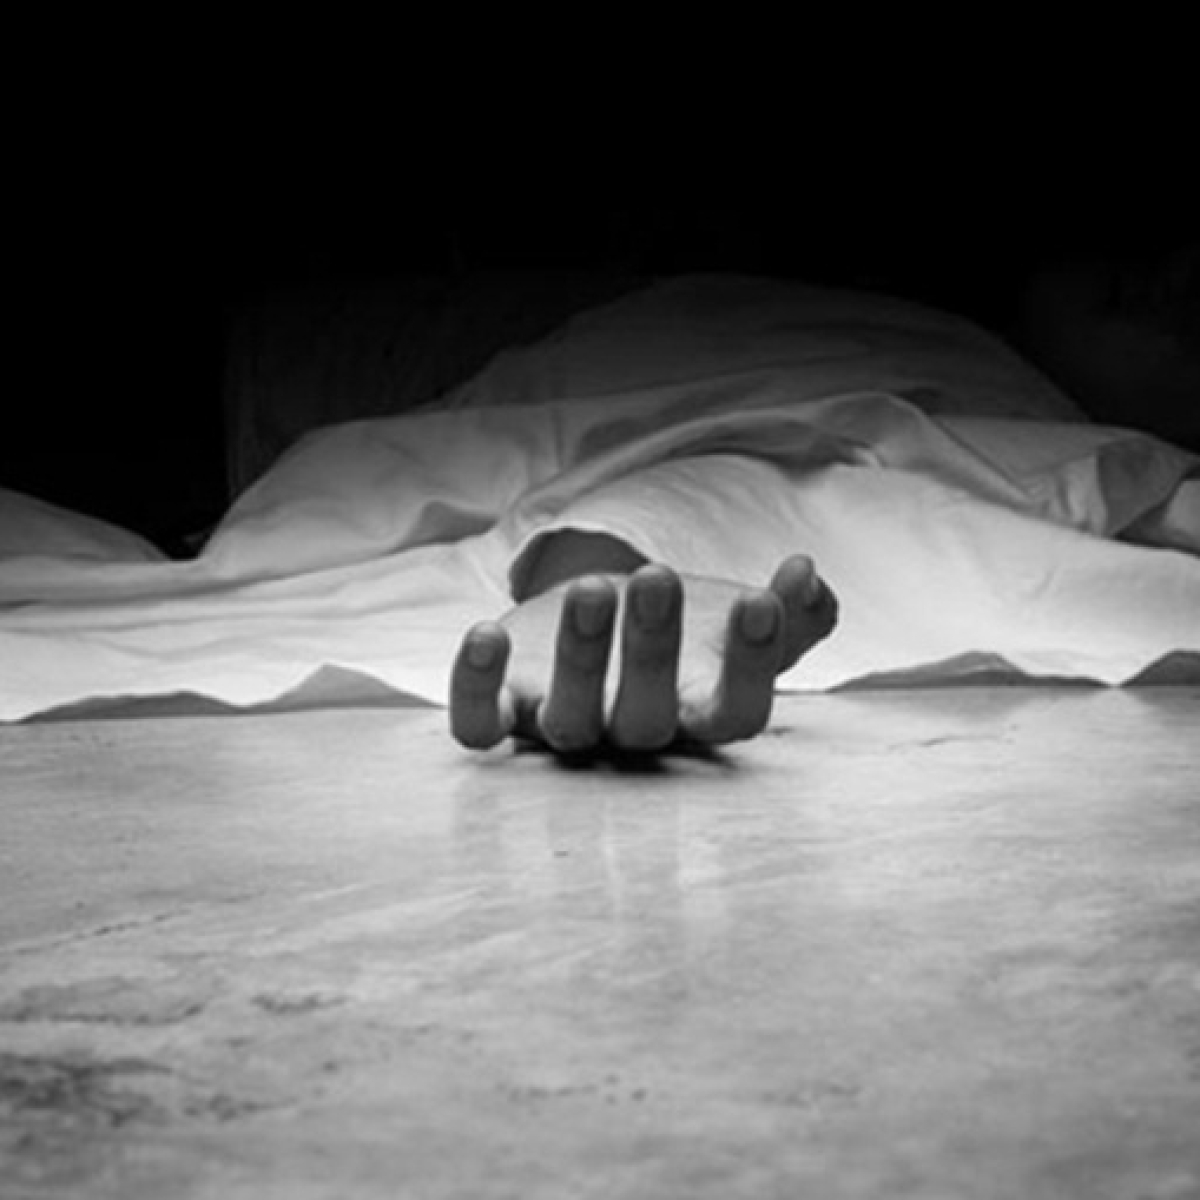 Maharashtra: Minors kill youth for affair with sister